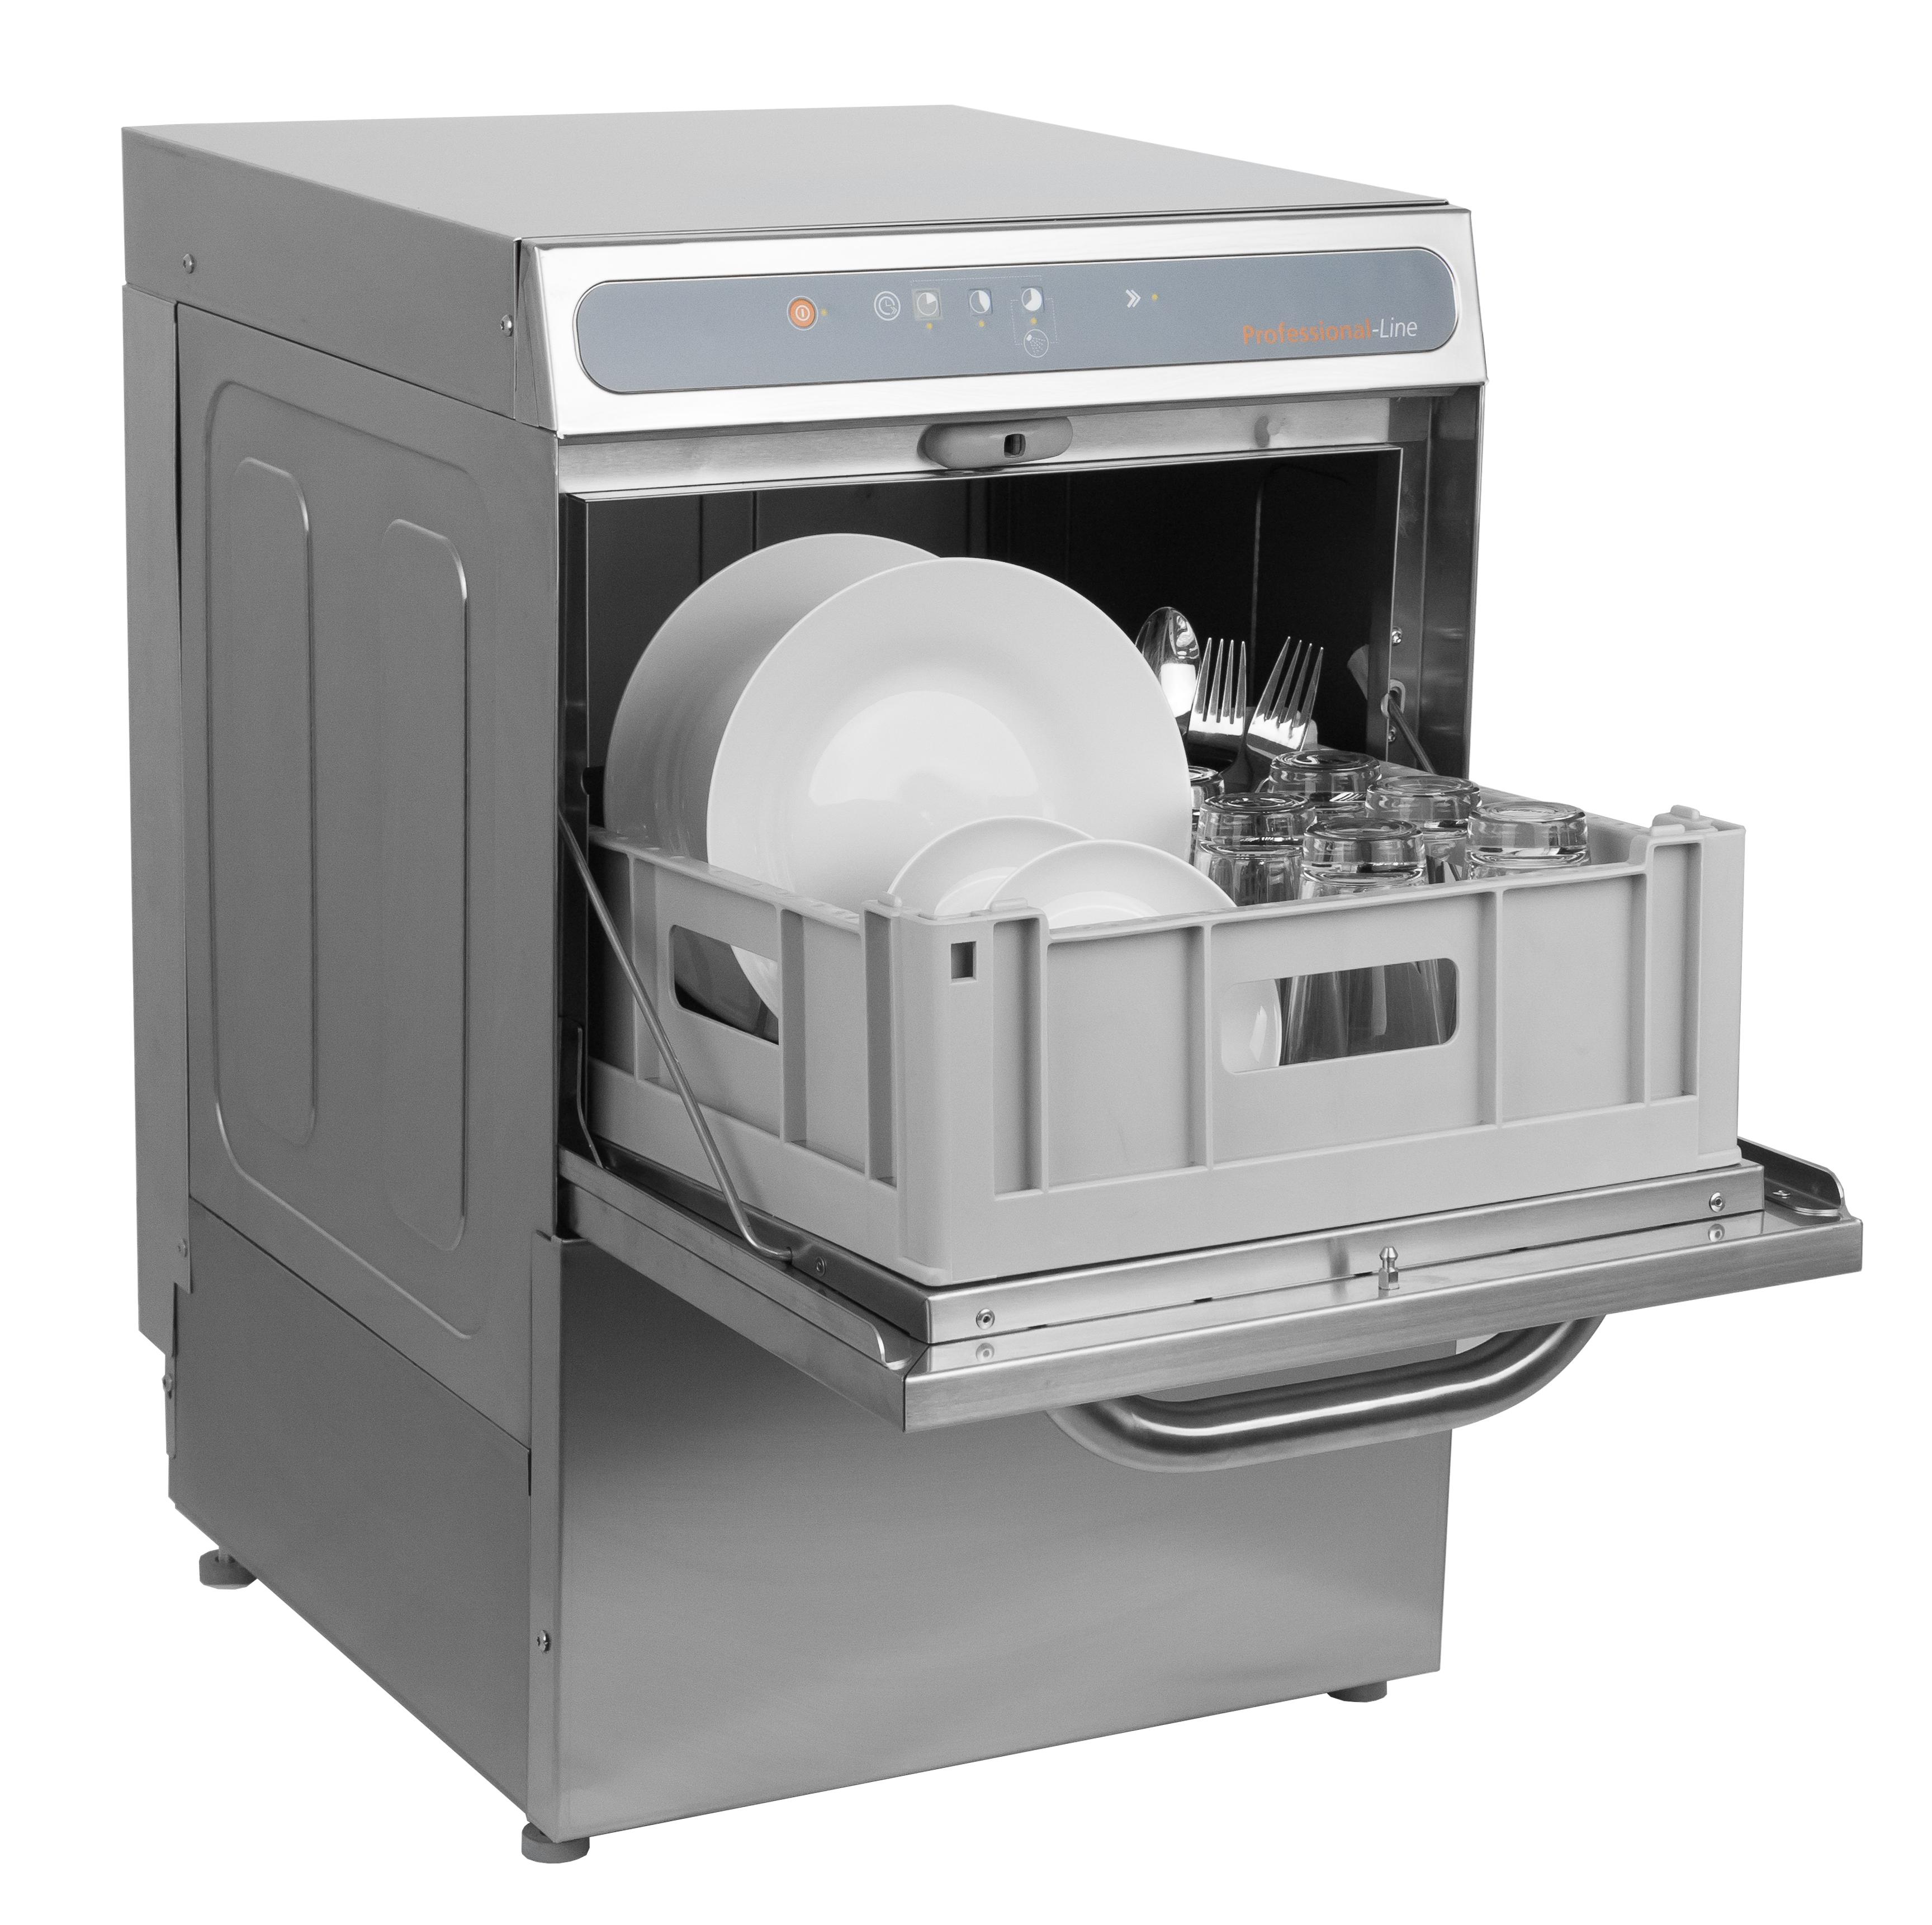 Gläserspülmaschine PROFI 40 SL Digital line Shop GASTRO HERO